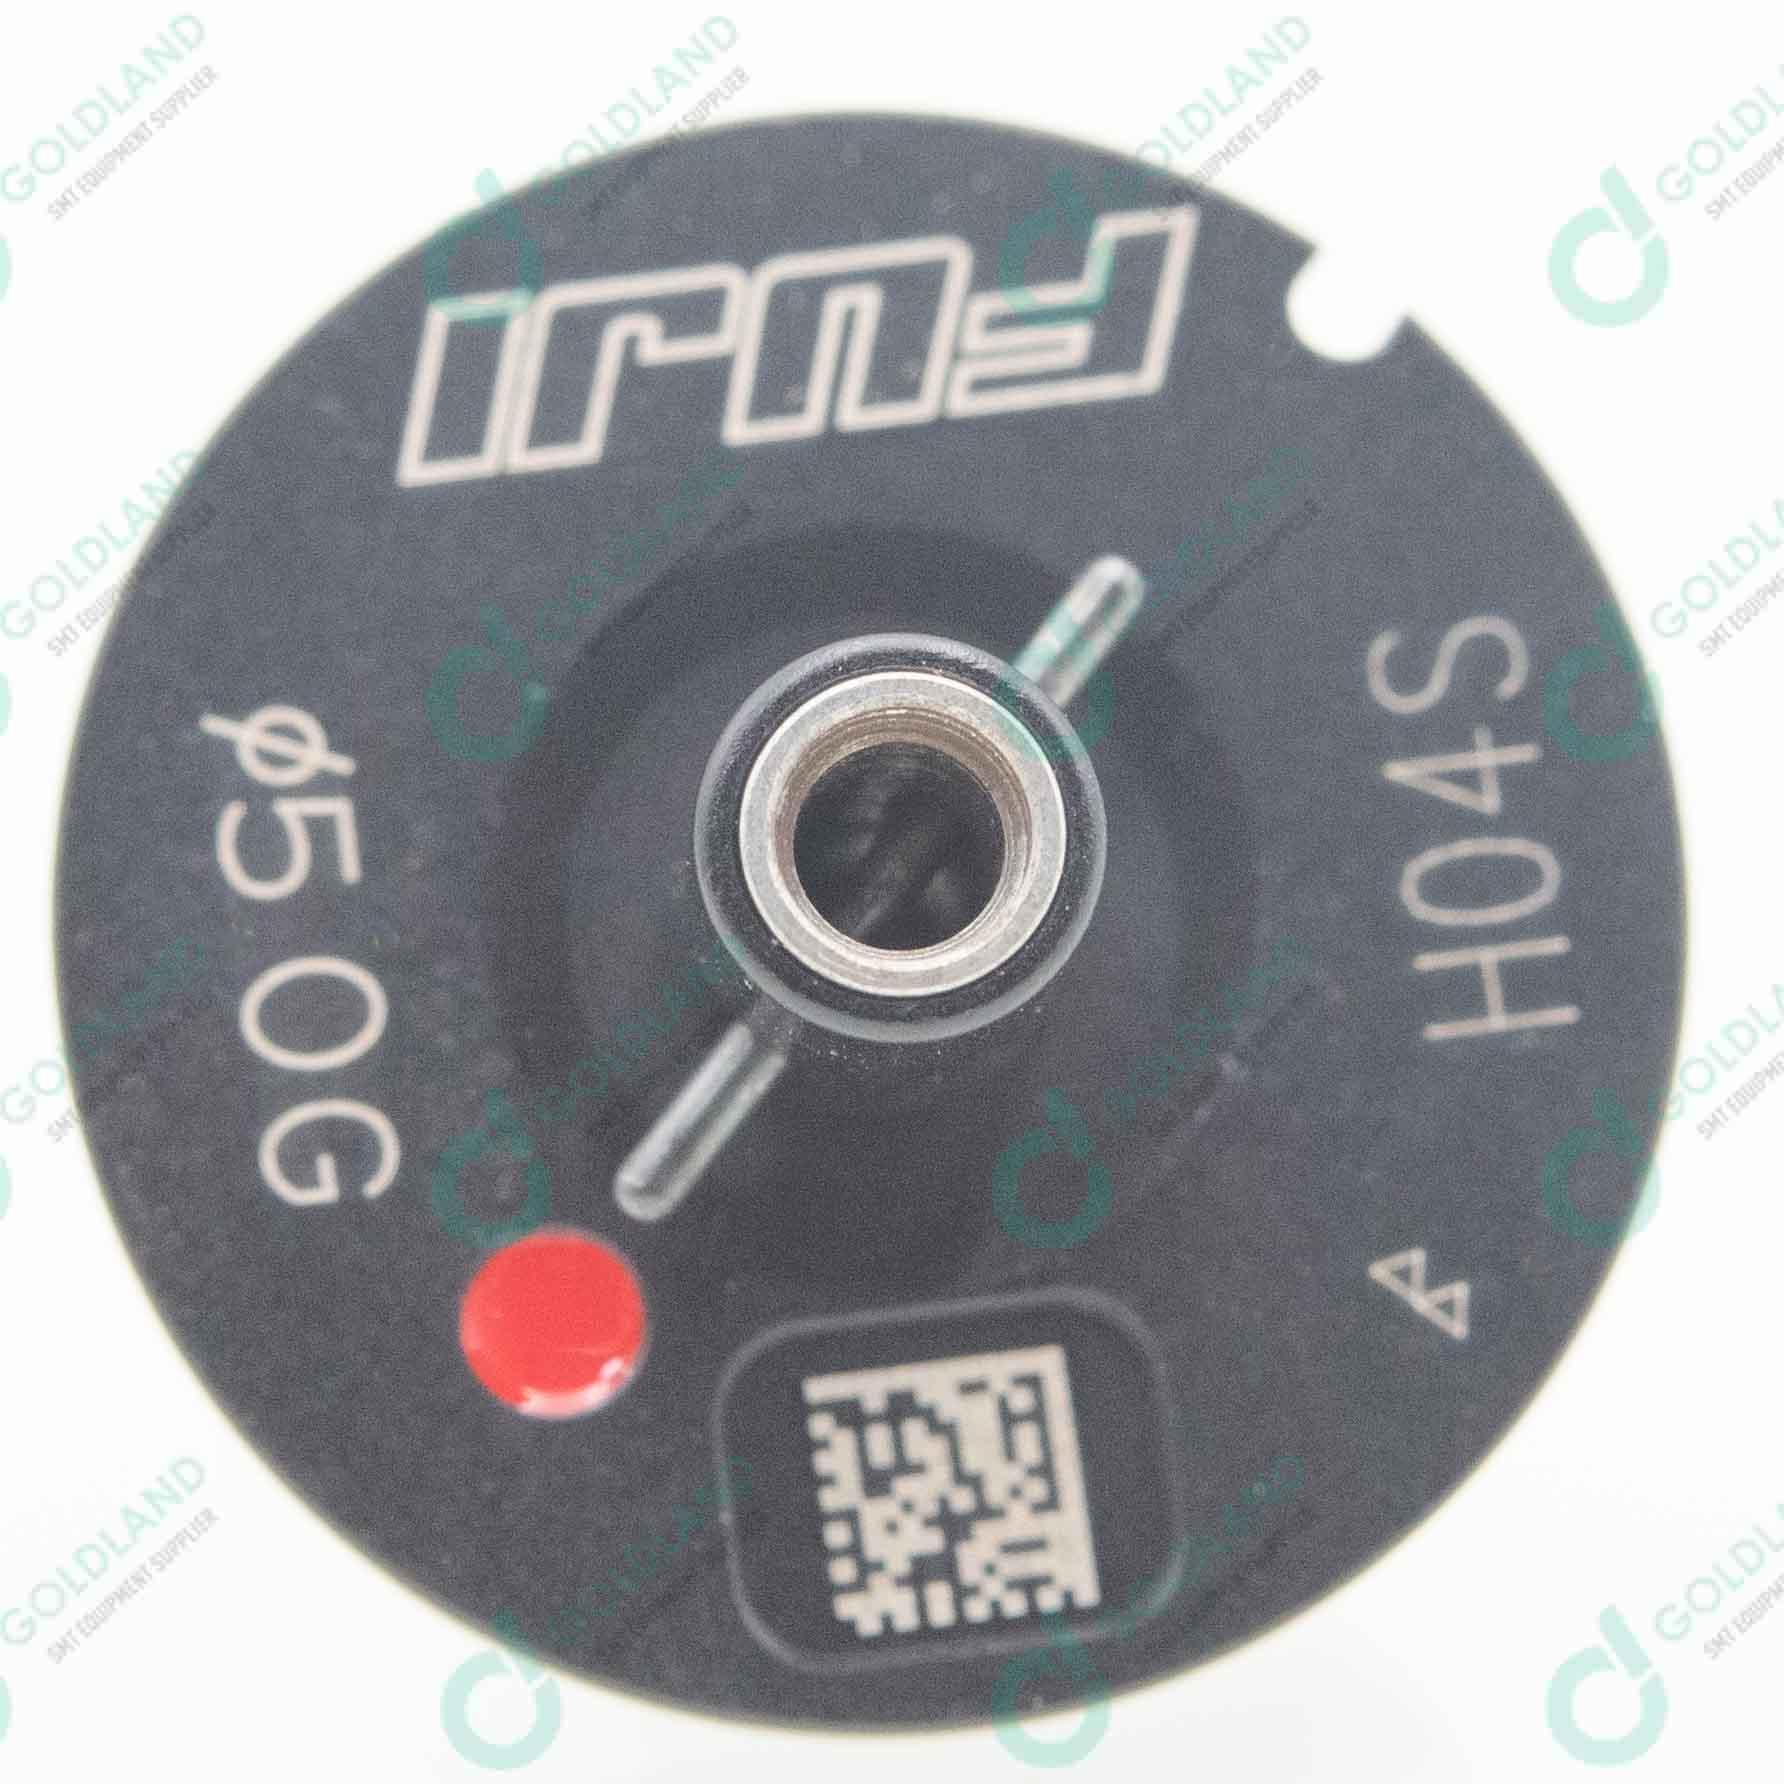 AA063 FUJI 5.0G NOZZLE for FUJI chip place machine parts